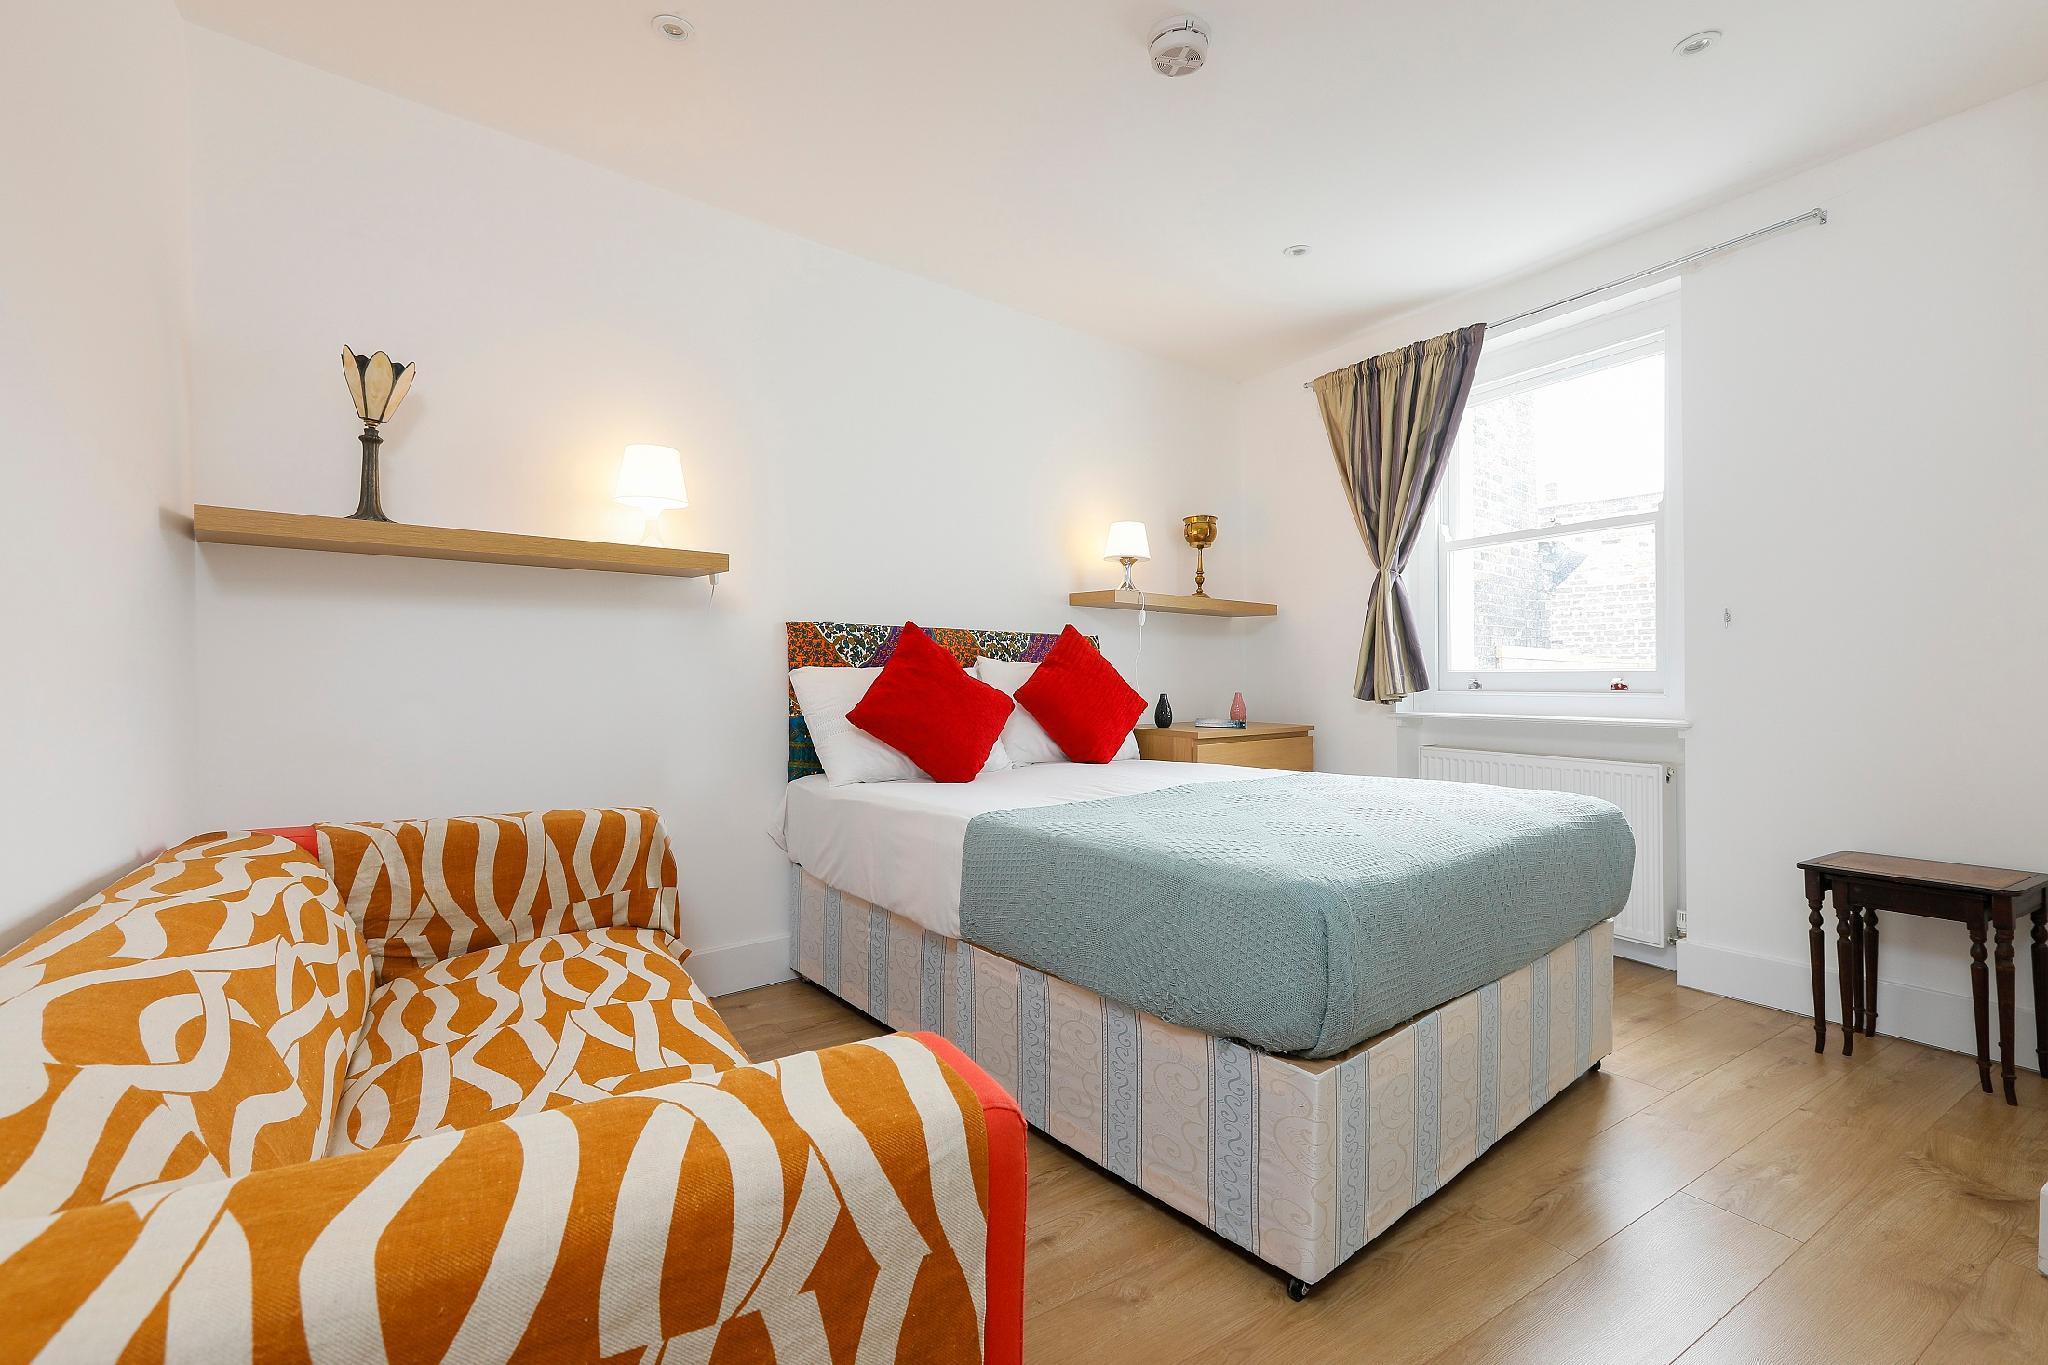 camden nike apartments hotel london in united kingdom rh priceline com